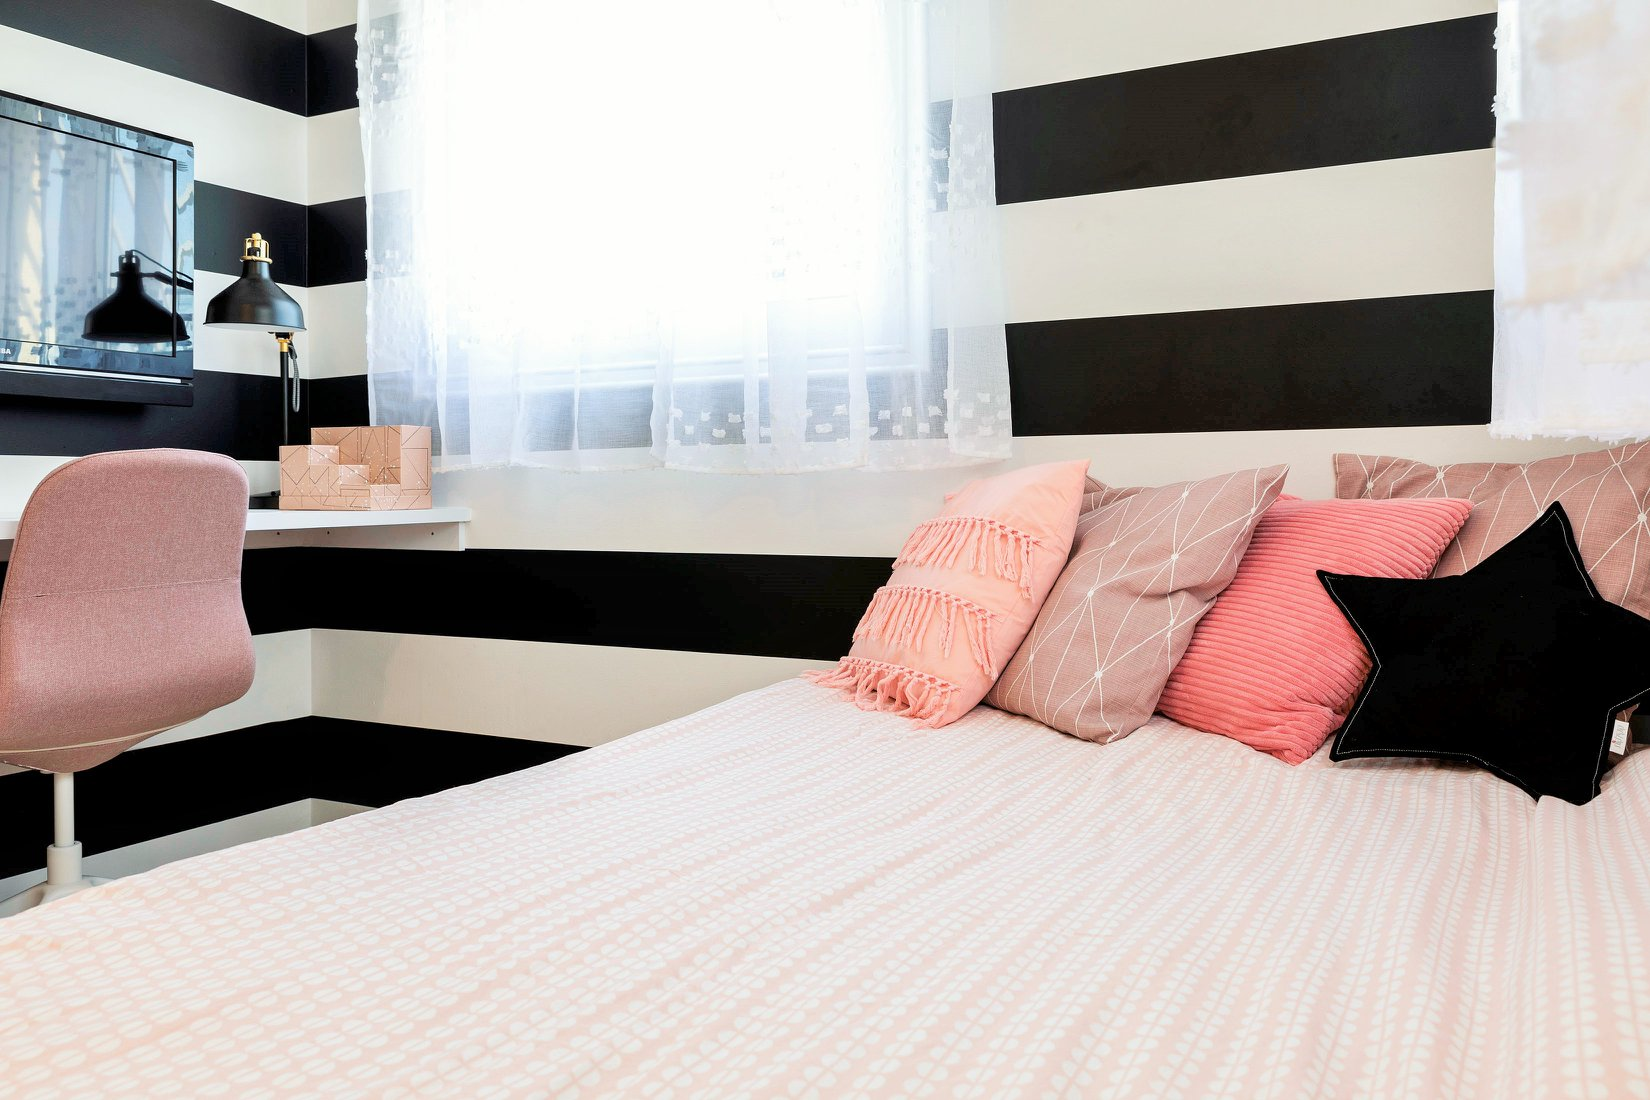 13עיצוב-חדר-לנערה-ליאן